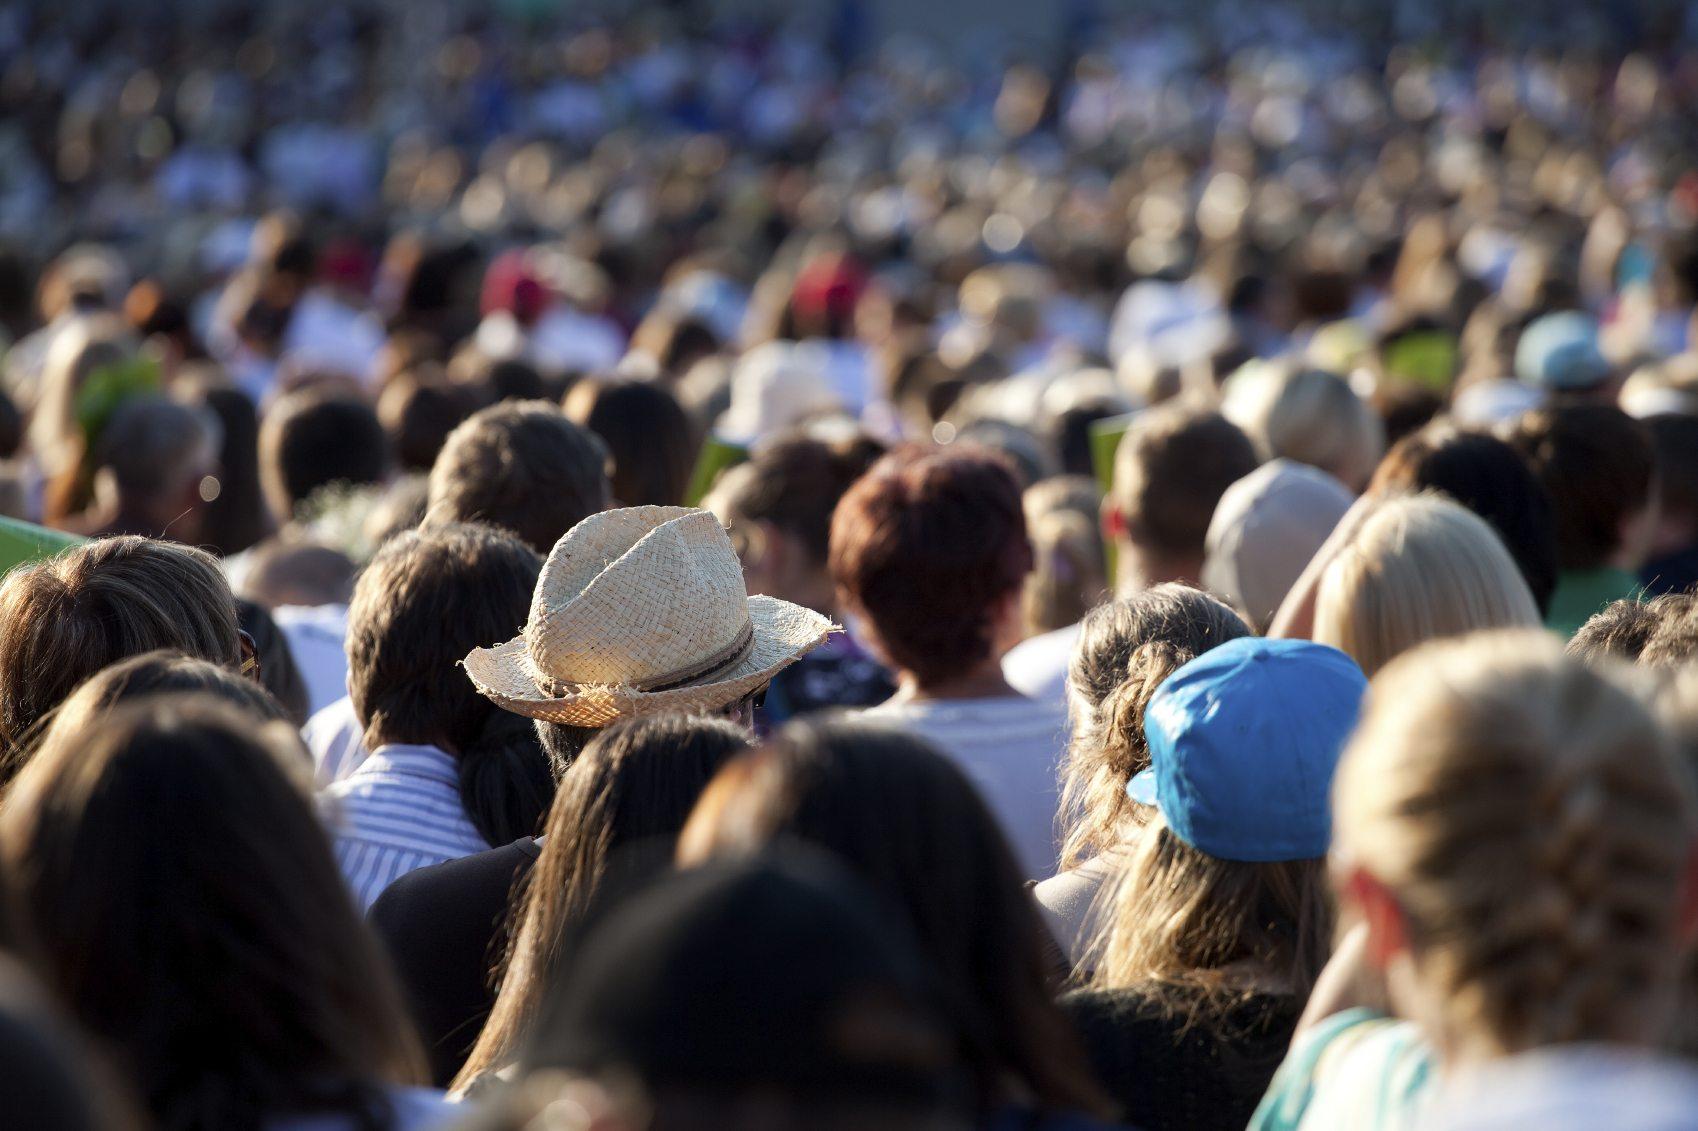 Tweedaagse opleiding Predictive Profiling in menigten